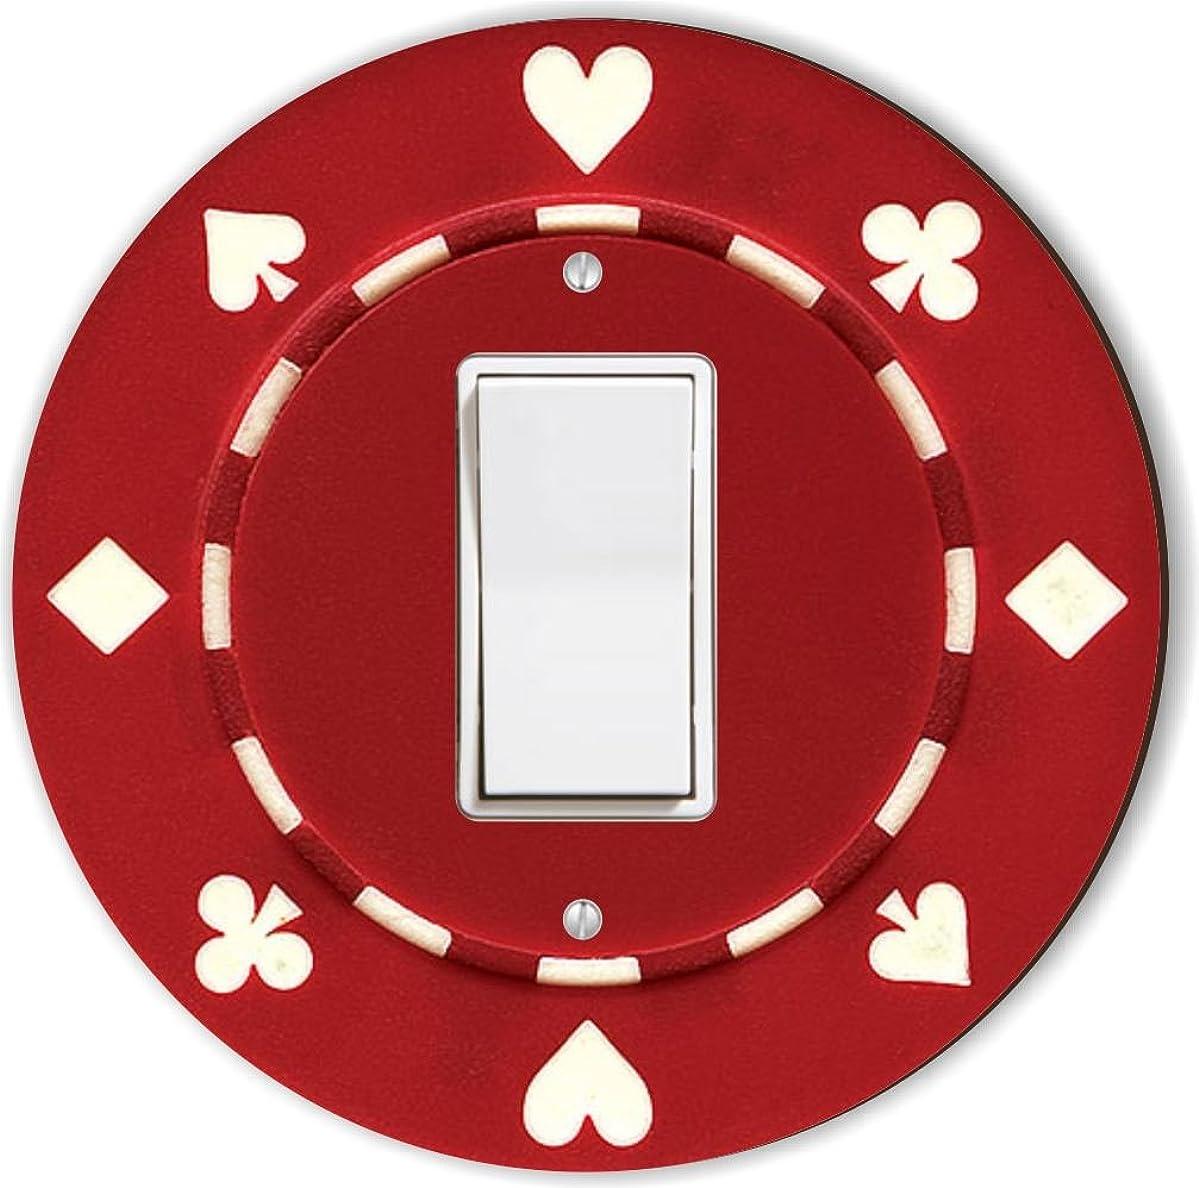 Rikki Knight RND-LSPROCK-83 Poker Chip Round Single Rocker Light Switch Plate, Red